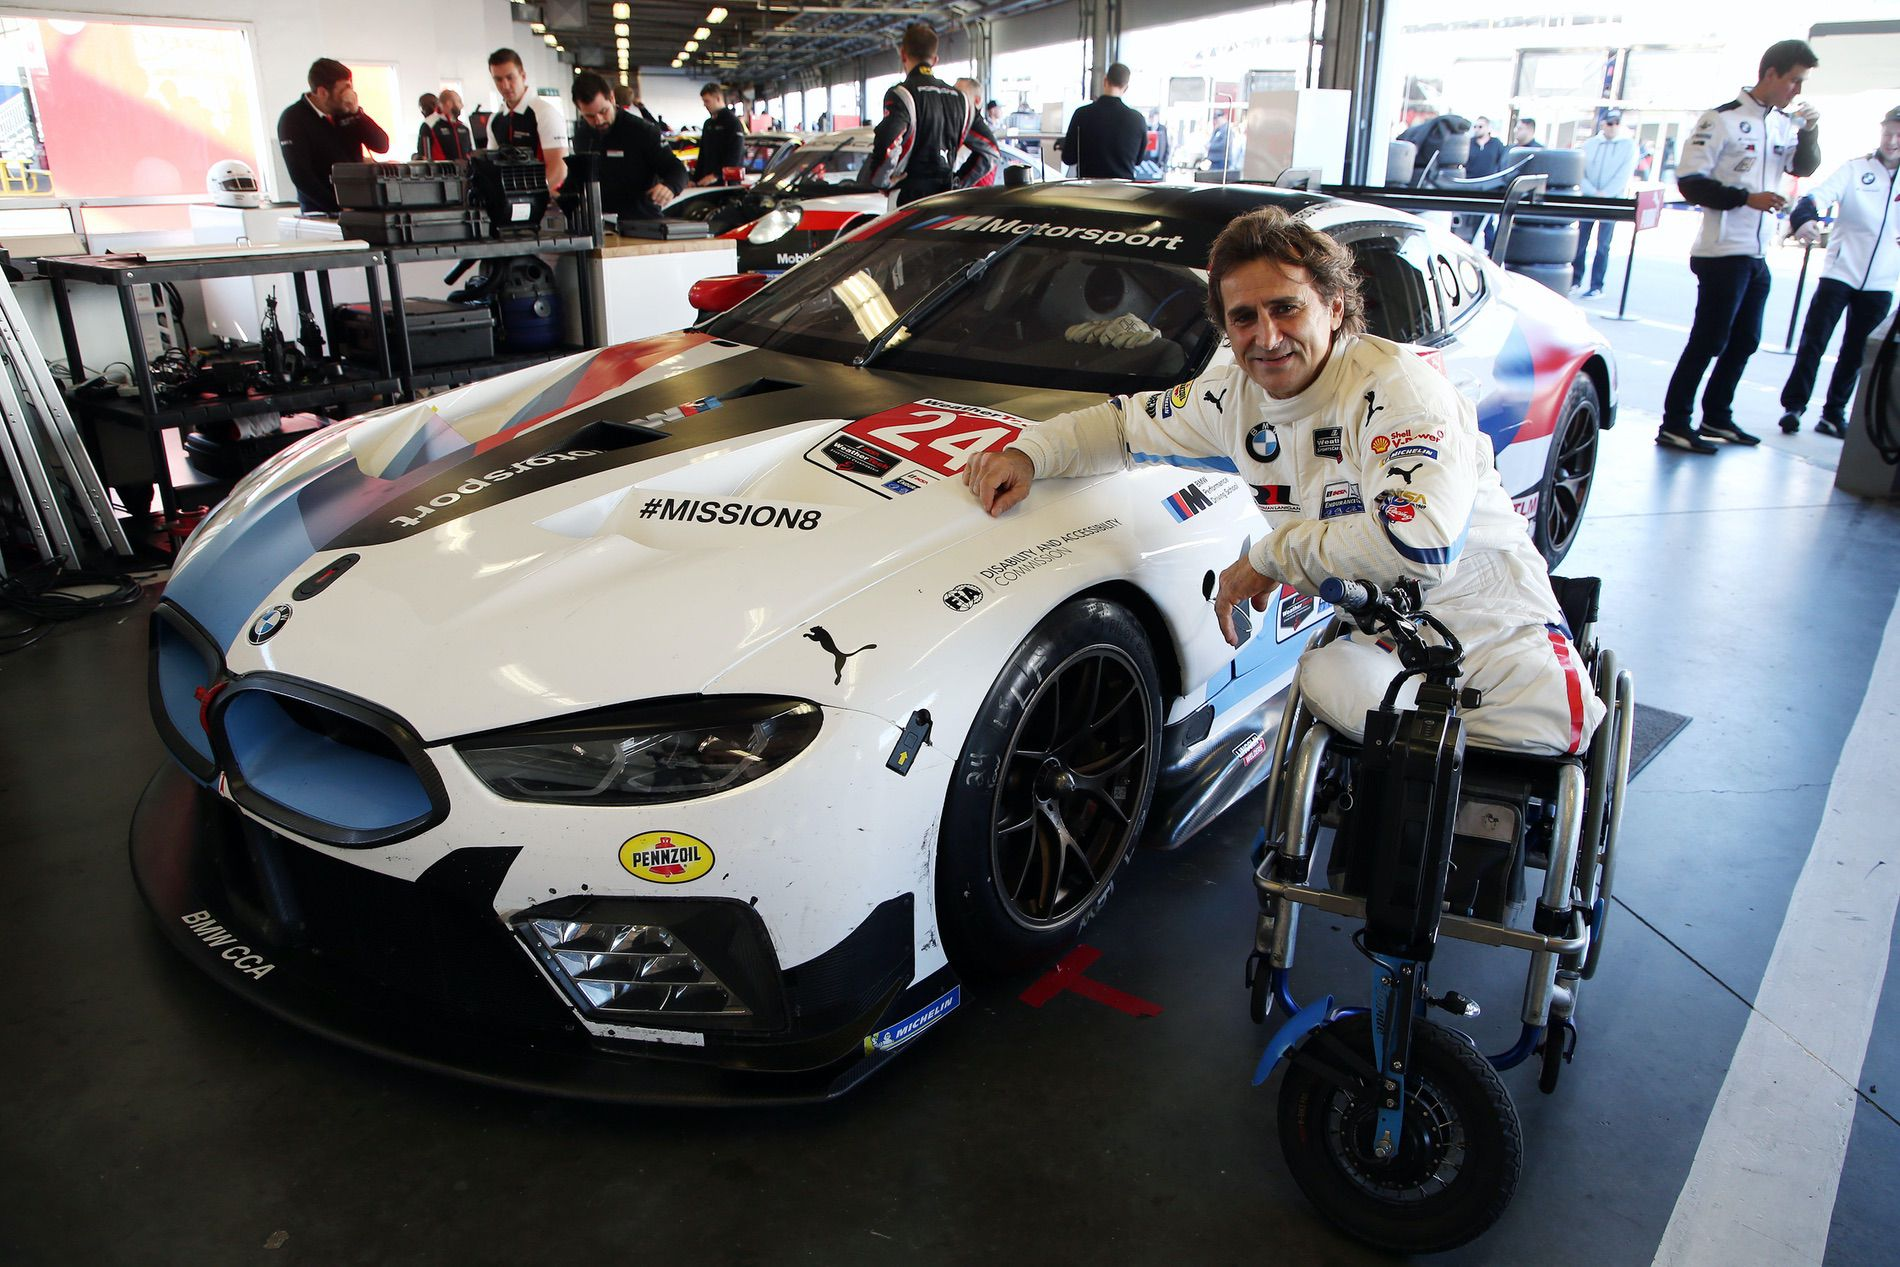 Alex Zanardi Daytona 05